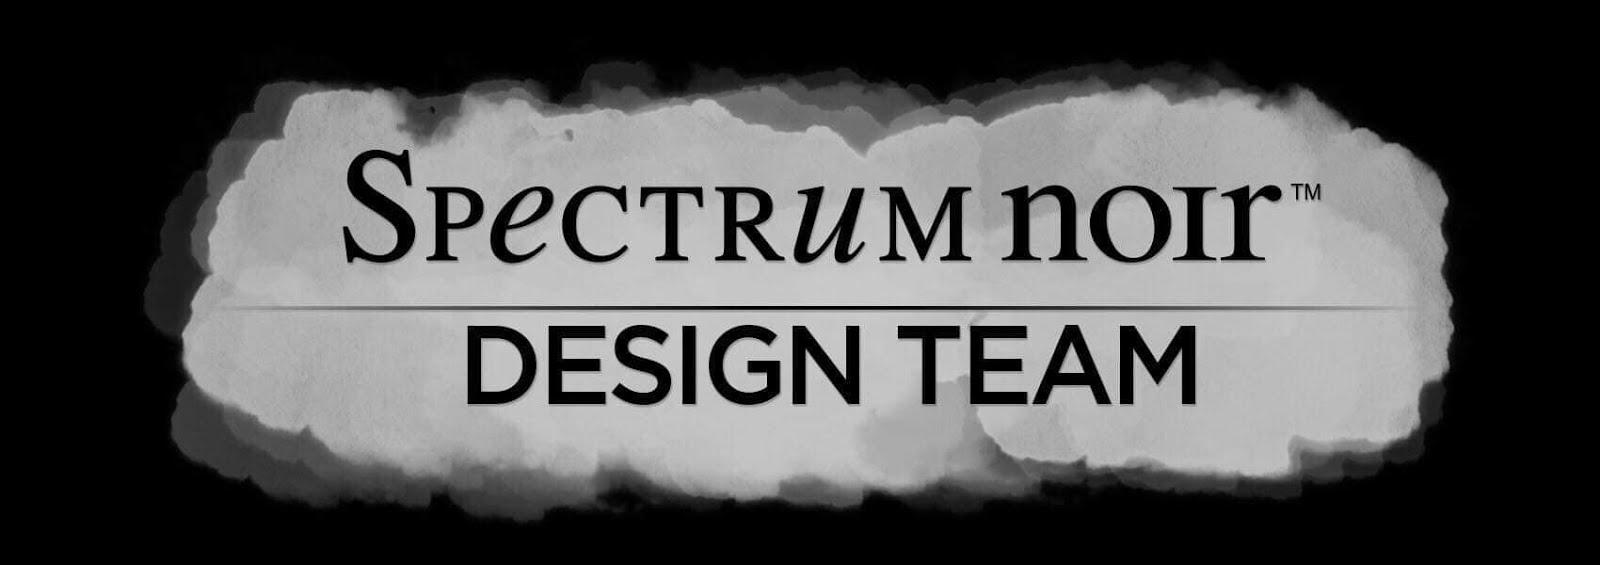 Current Design Teams